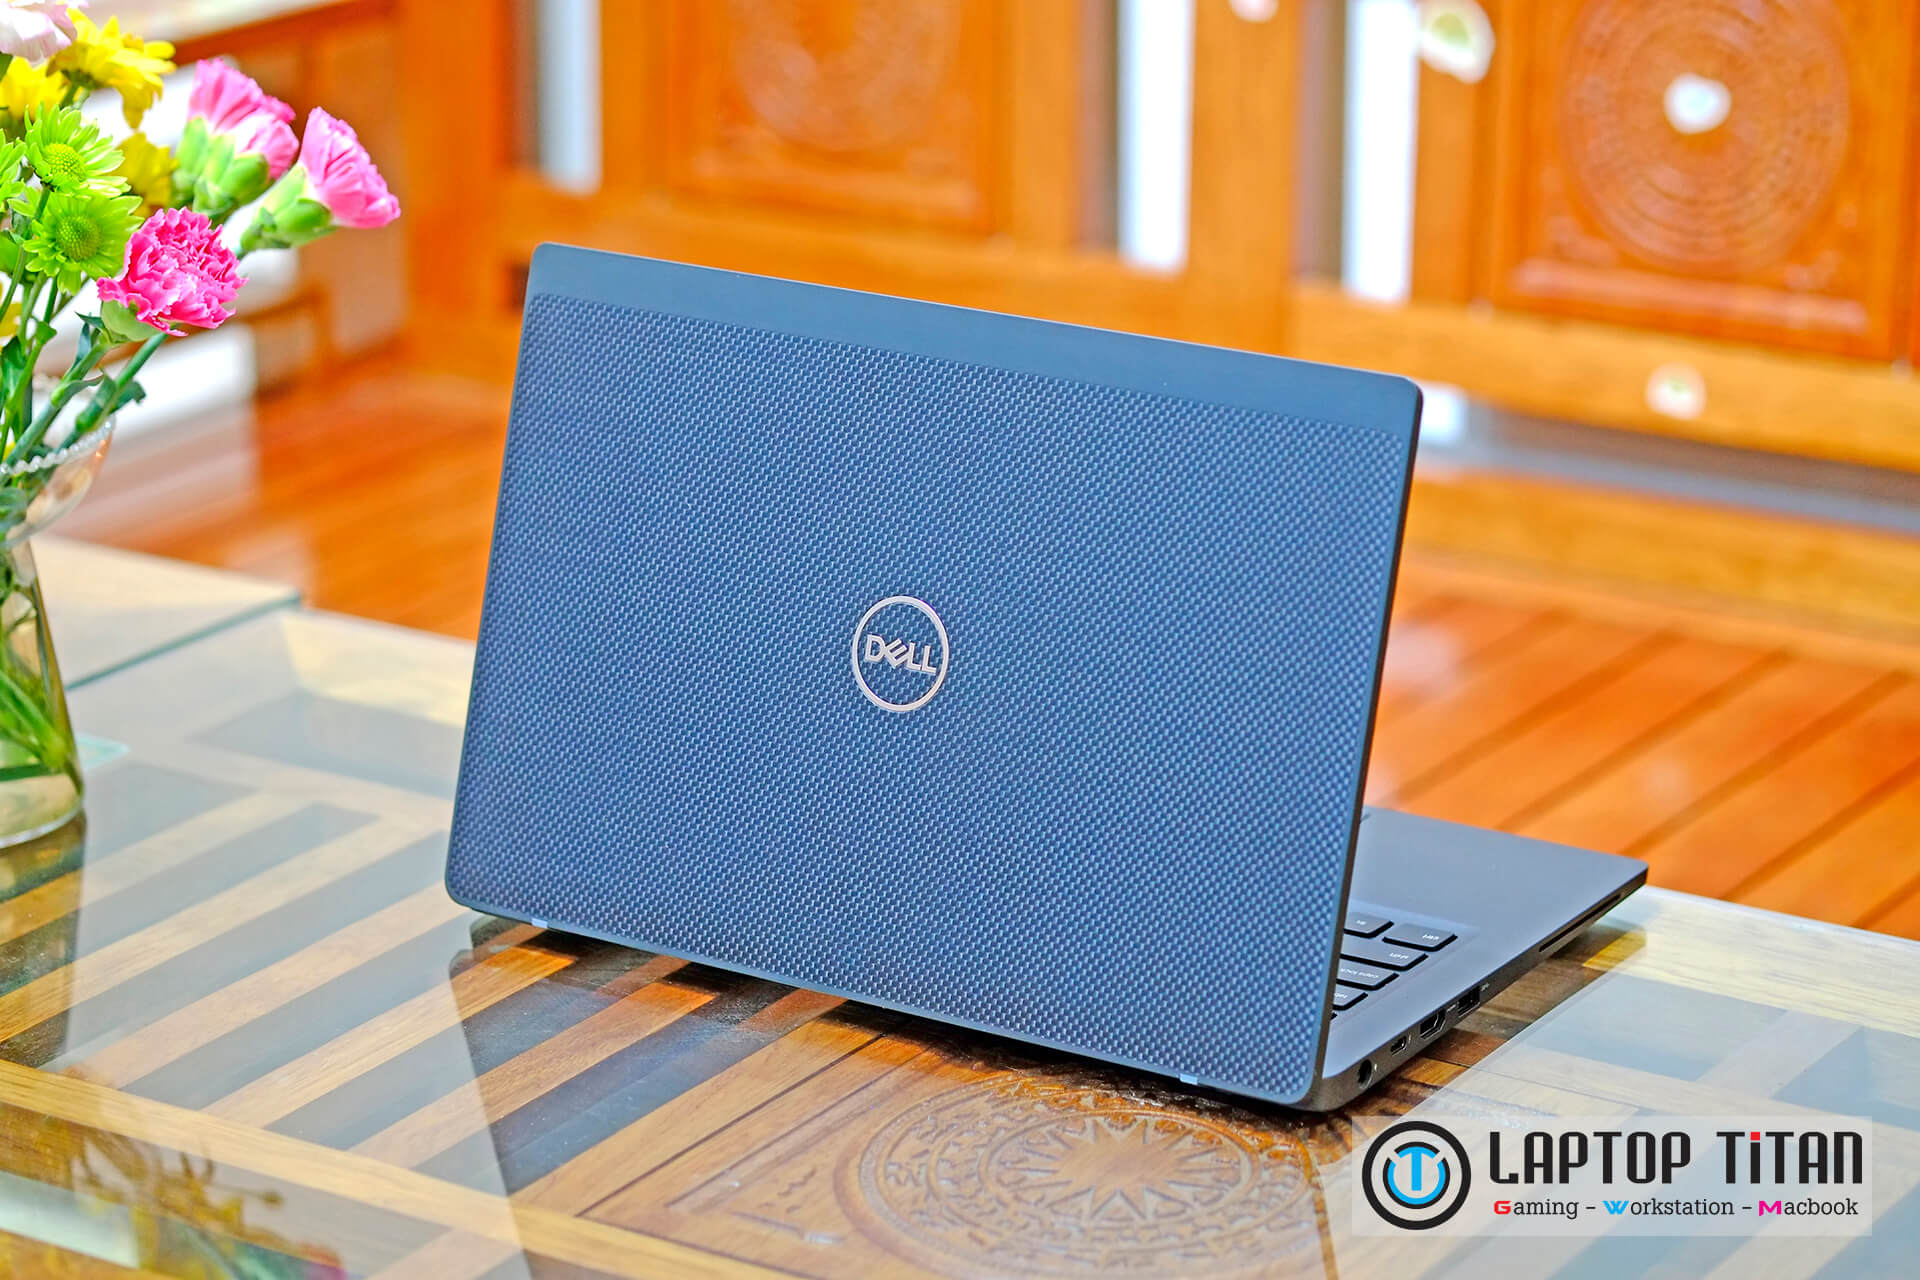 Dell Latitude 7400 laptoptitan 07